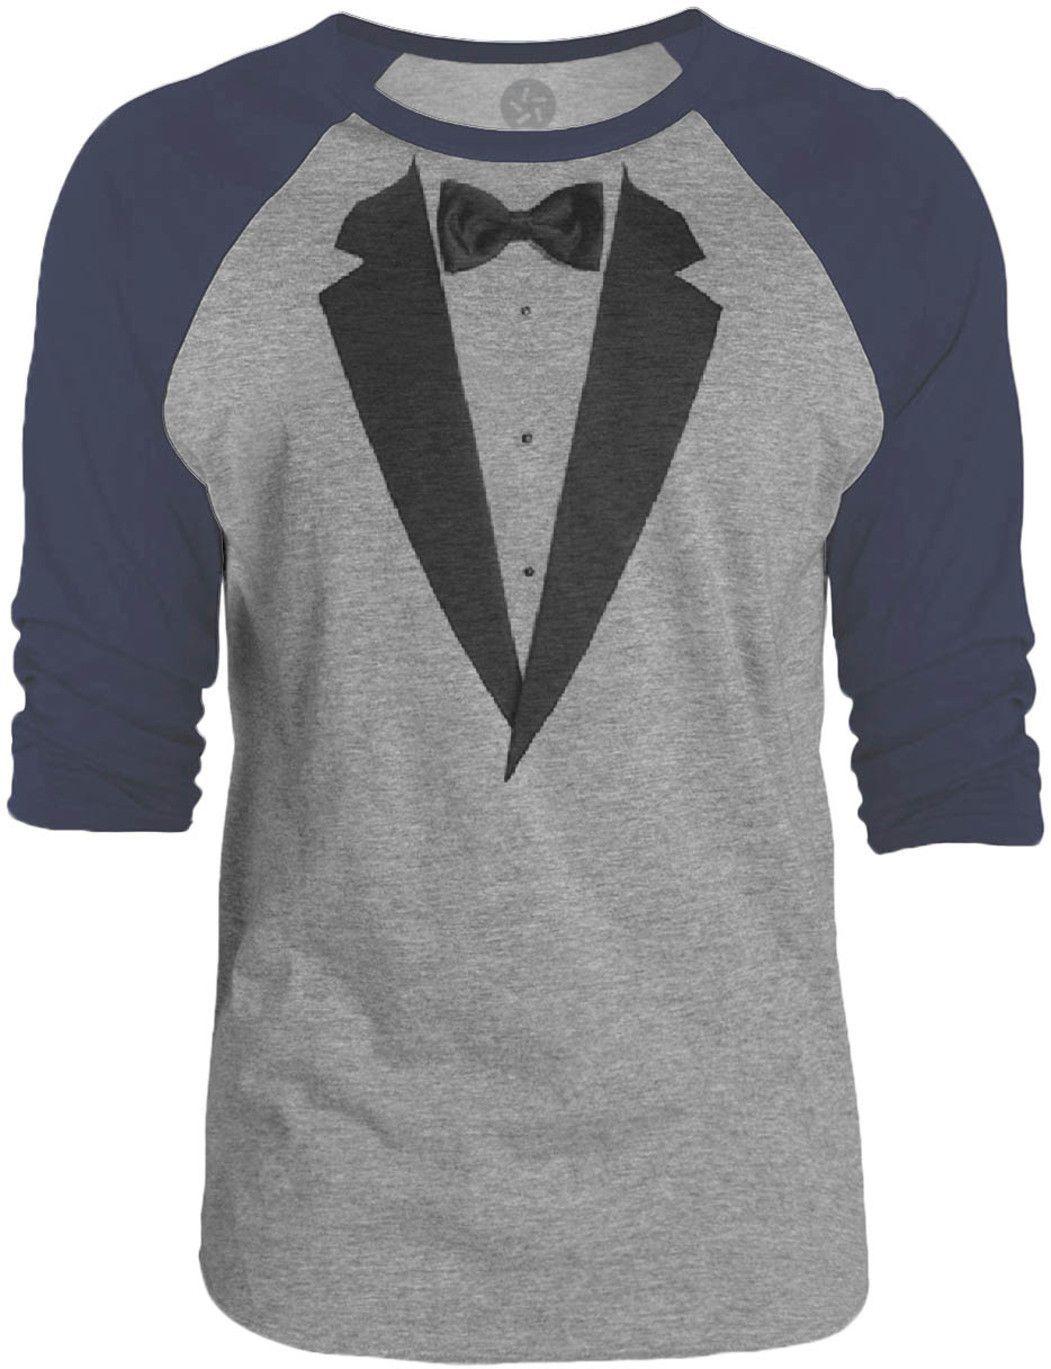 Big Texas Realistic Tuxedo (Black) 3/4-Sleeve Raglan Baseball T-Shirt